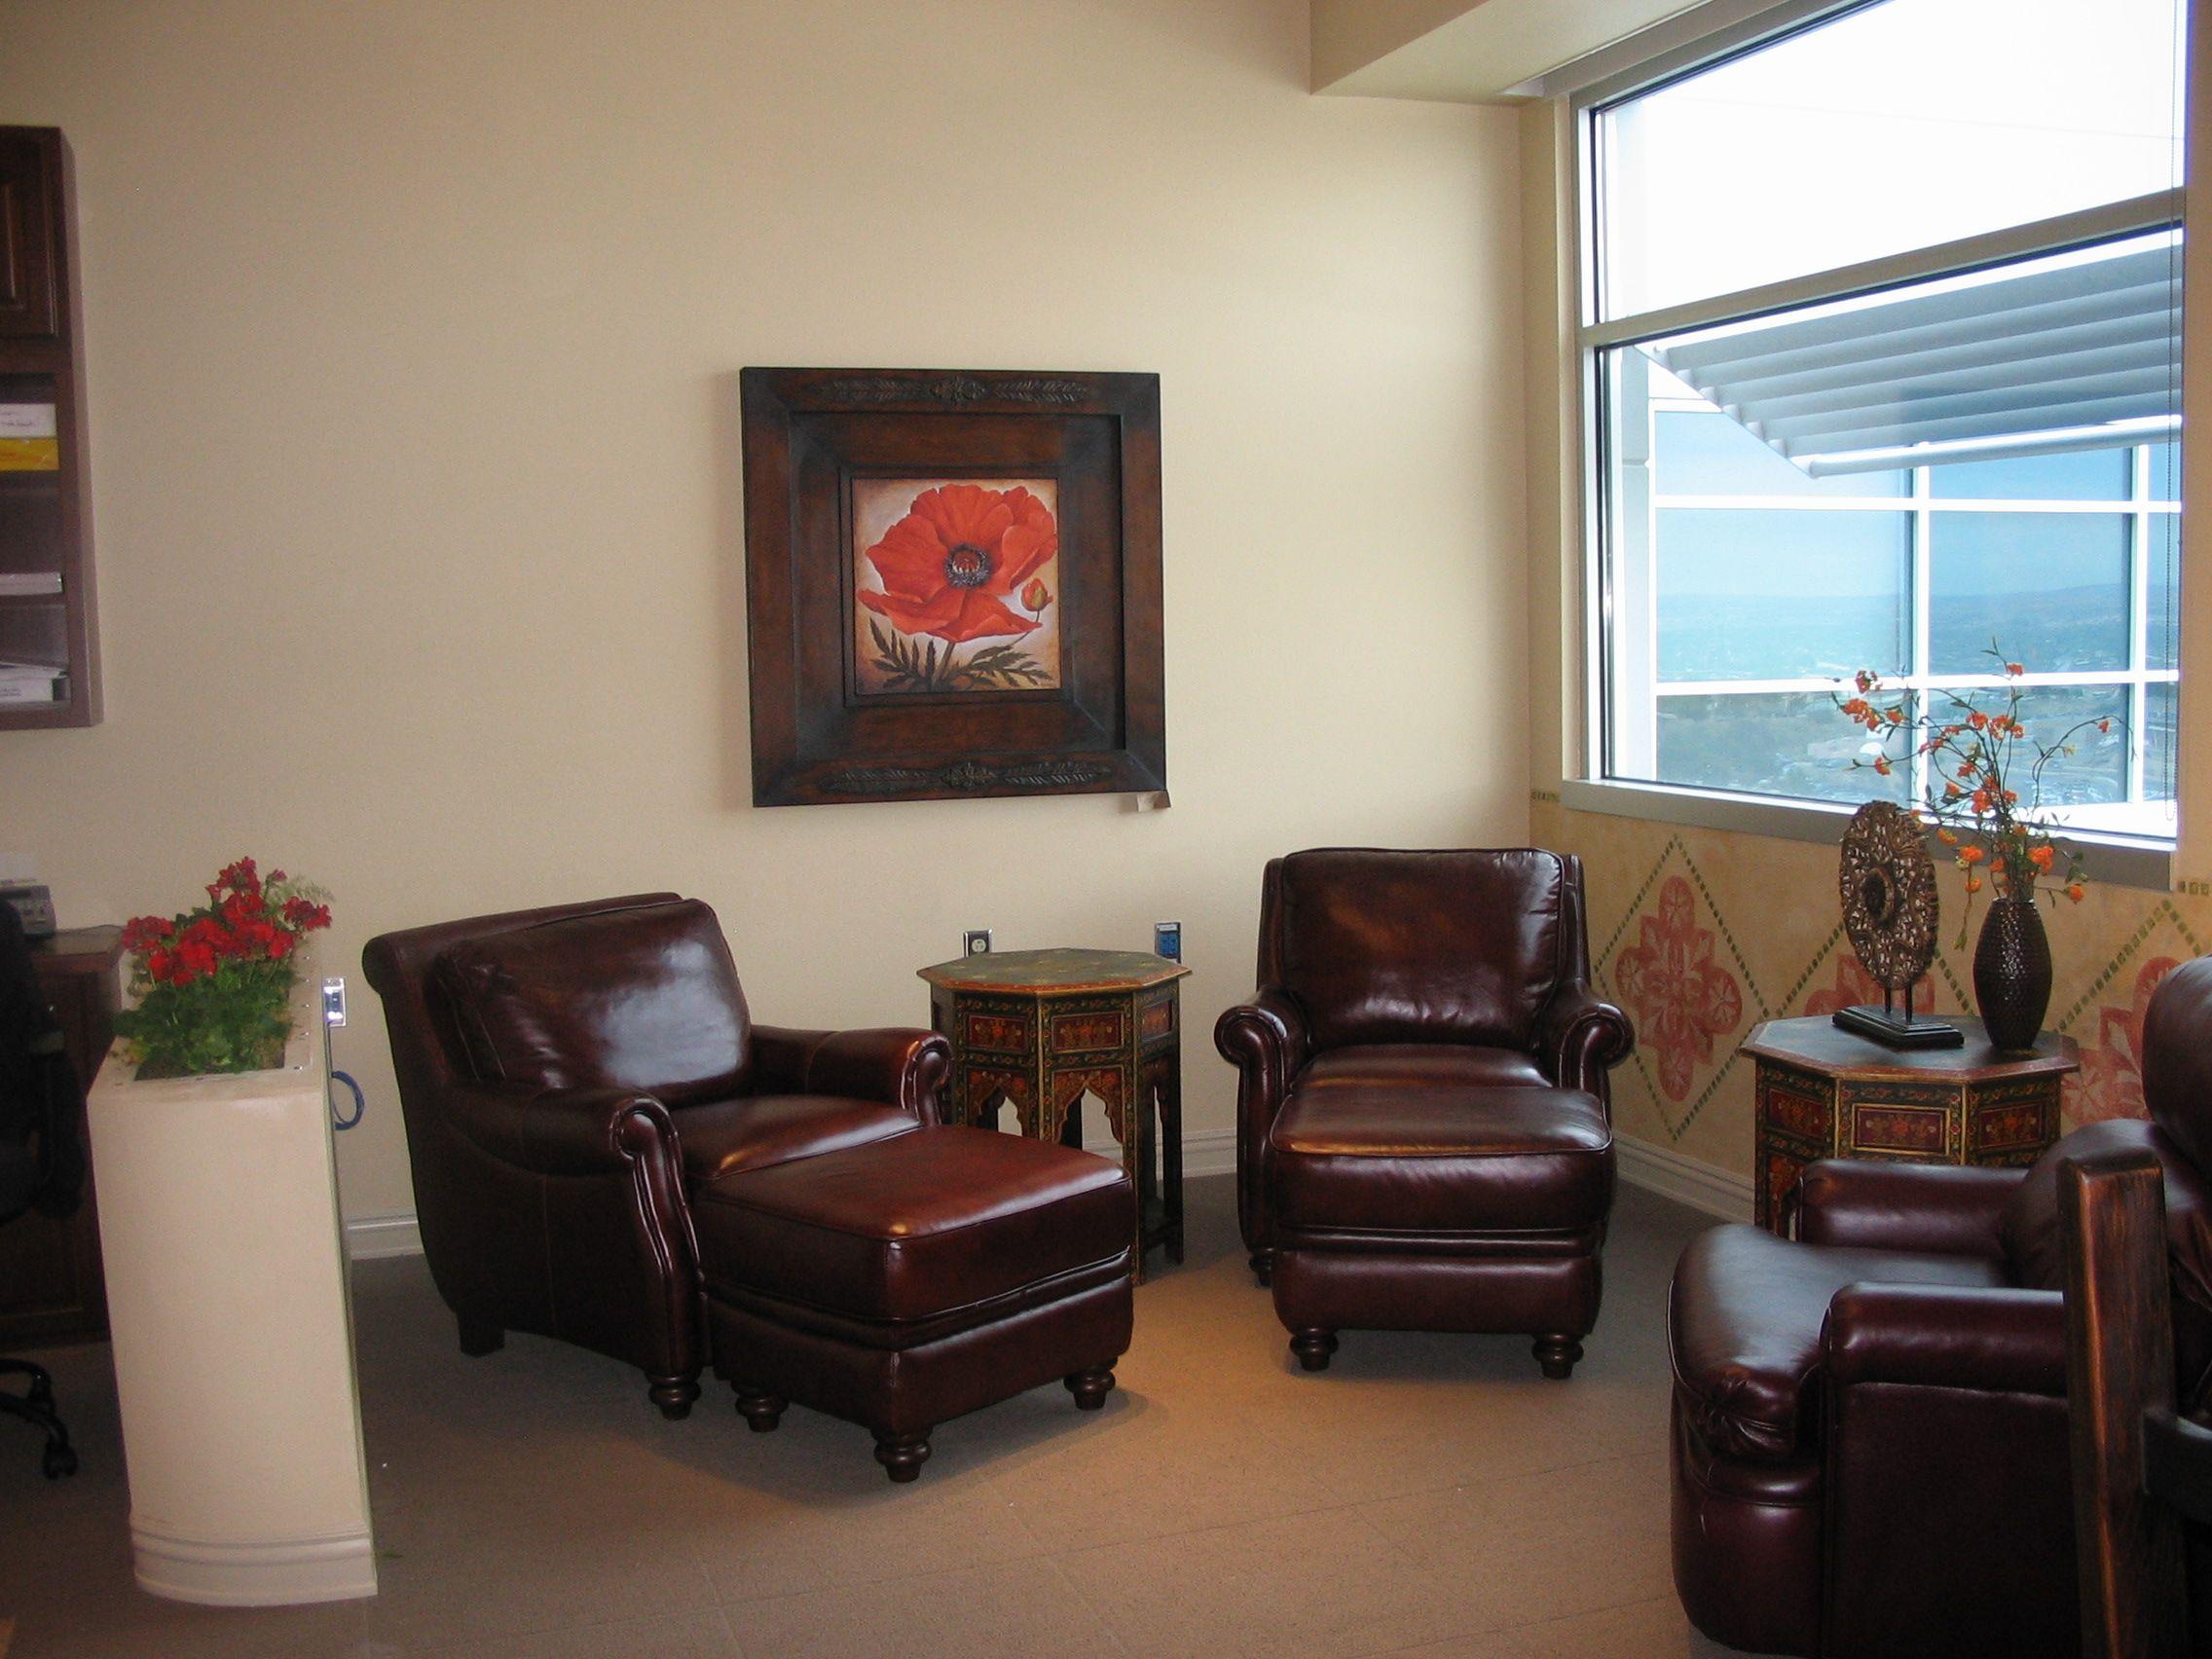 Ronald Mcdonald Family Room In The University Of New Mexico